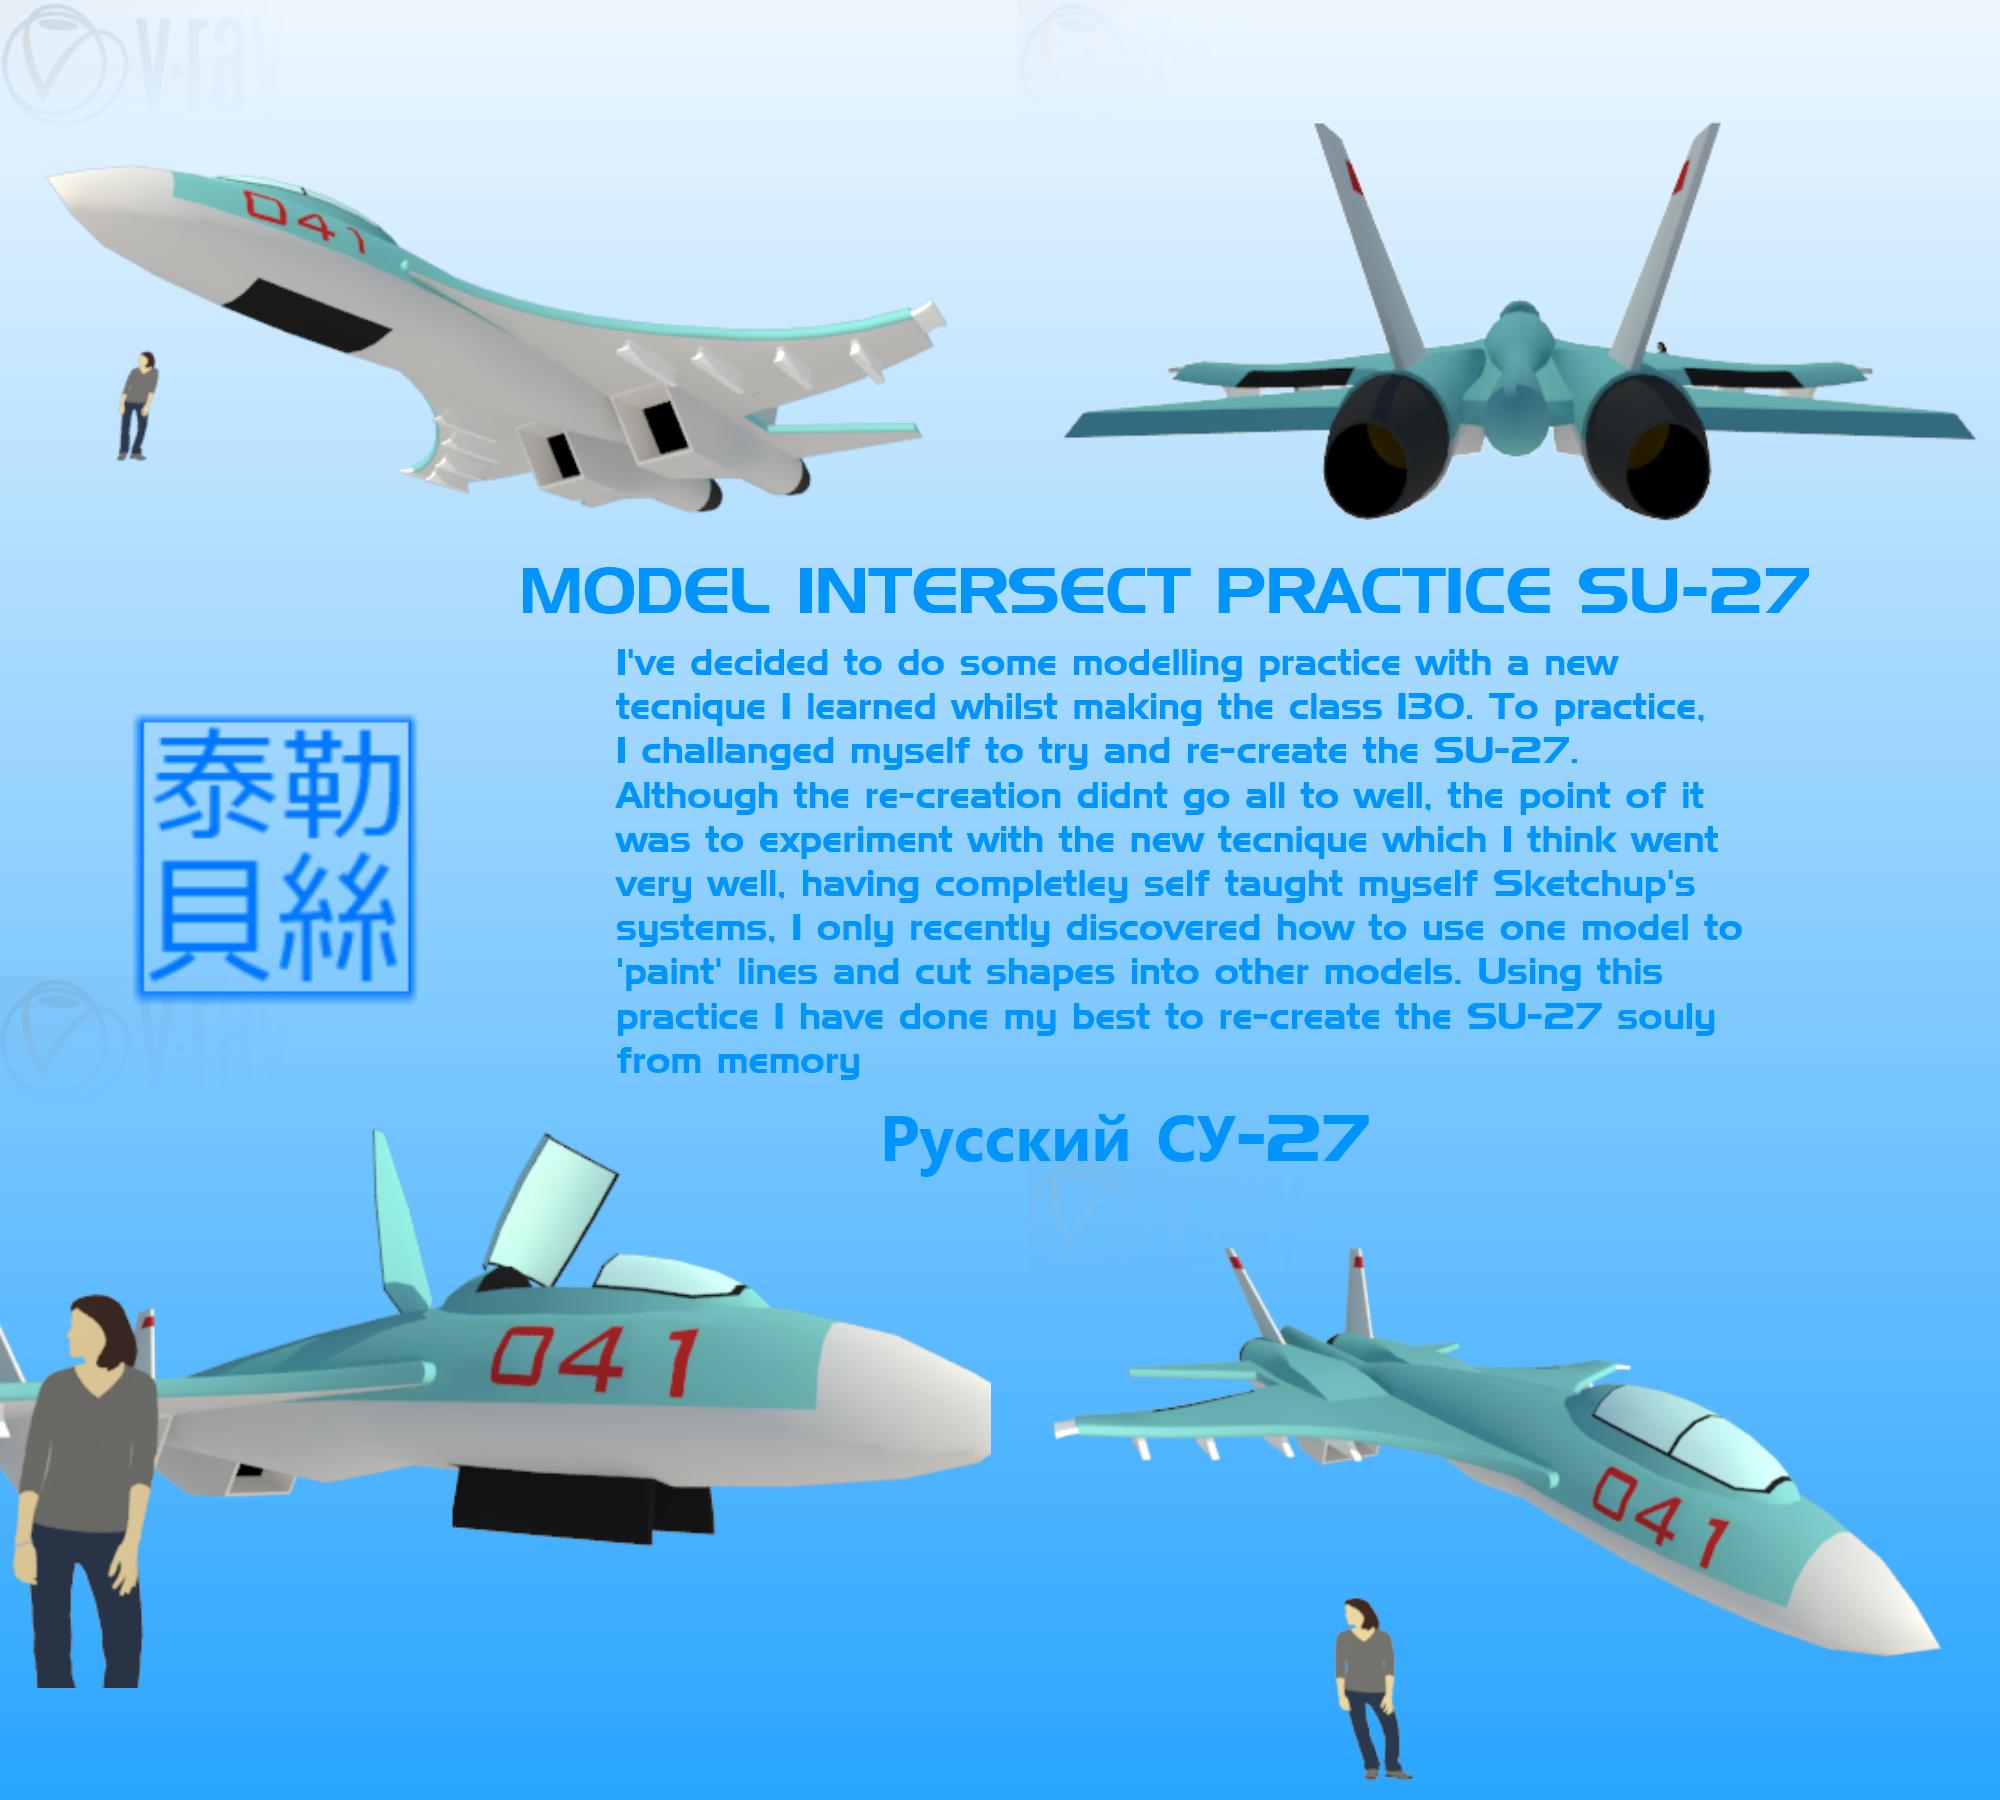 SU27 Practice [Model Intersection] by Gwentari